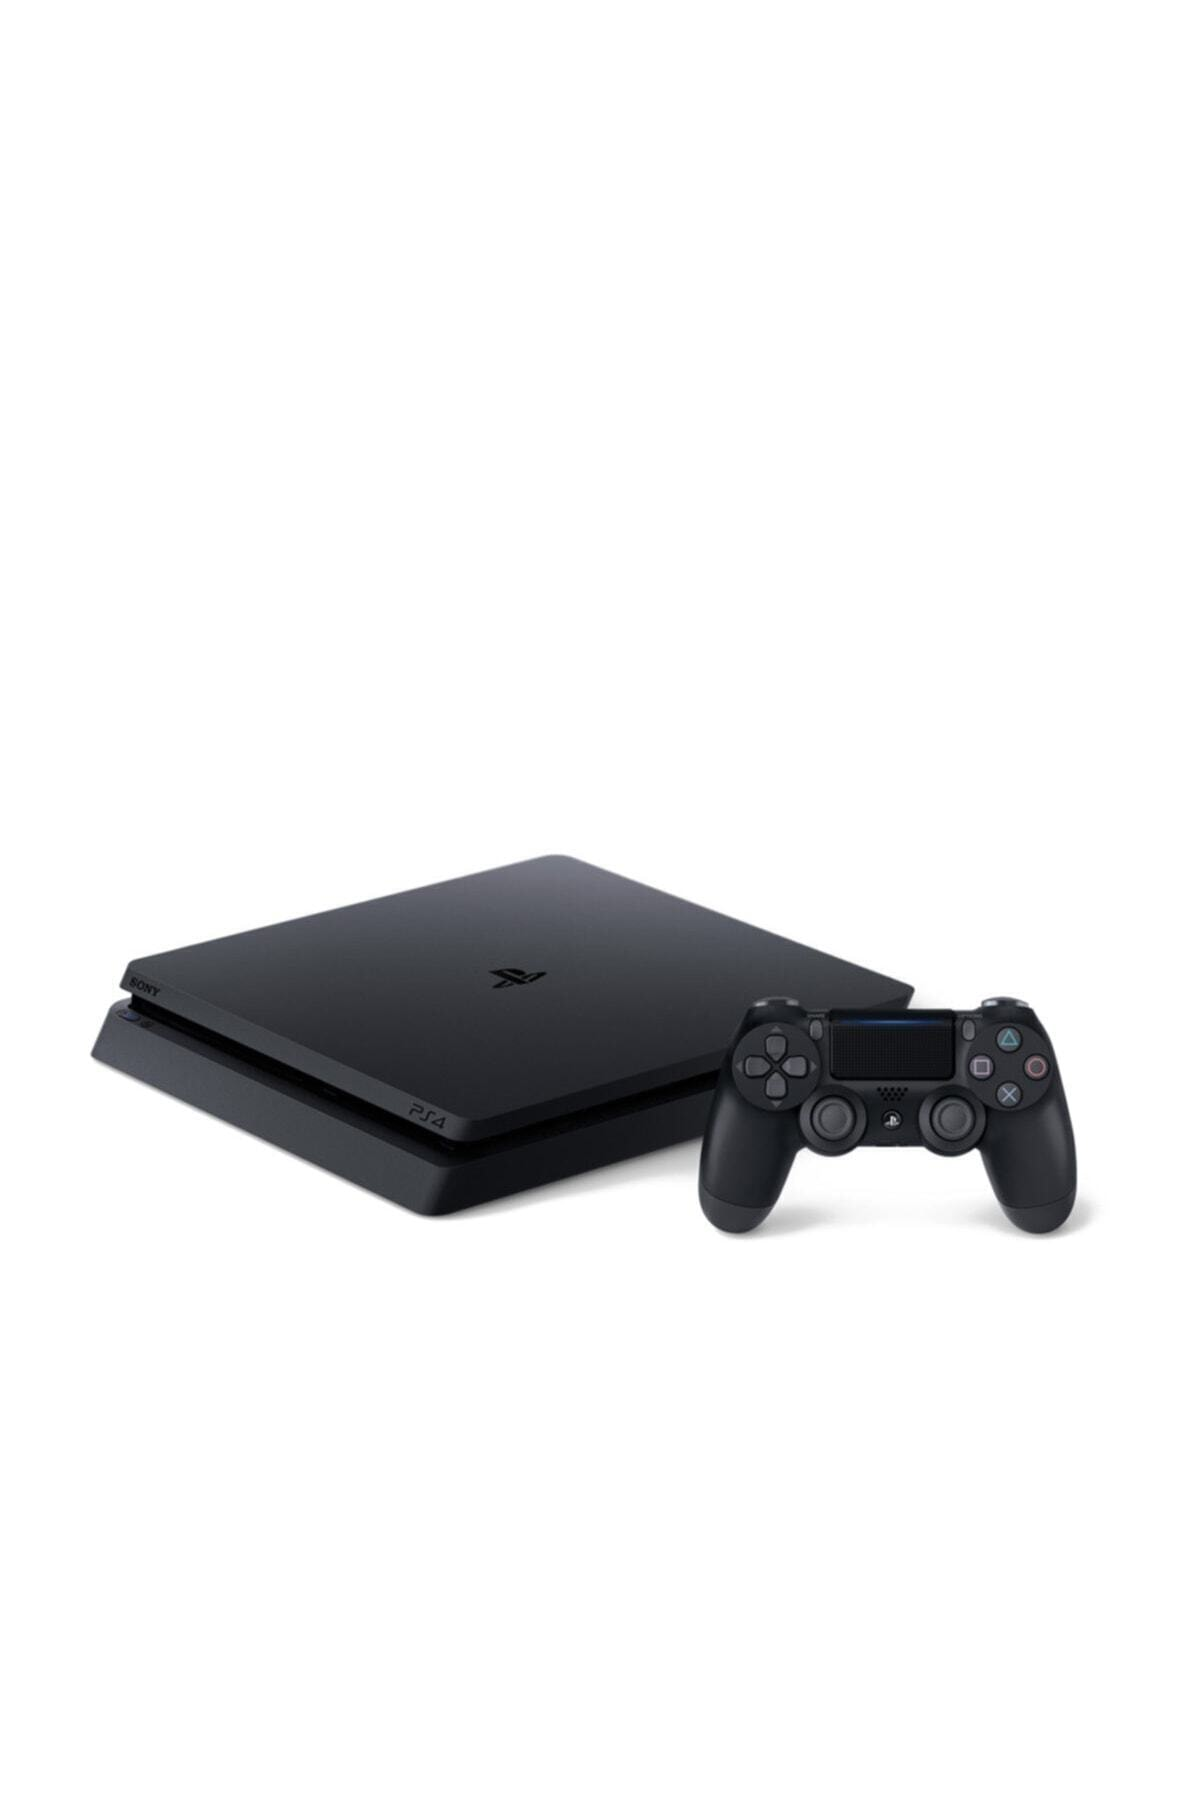 Sony Playstation 4 Slim 500 Gb - Türkçe Menü (Eurasia Garantili) 2